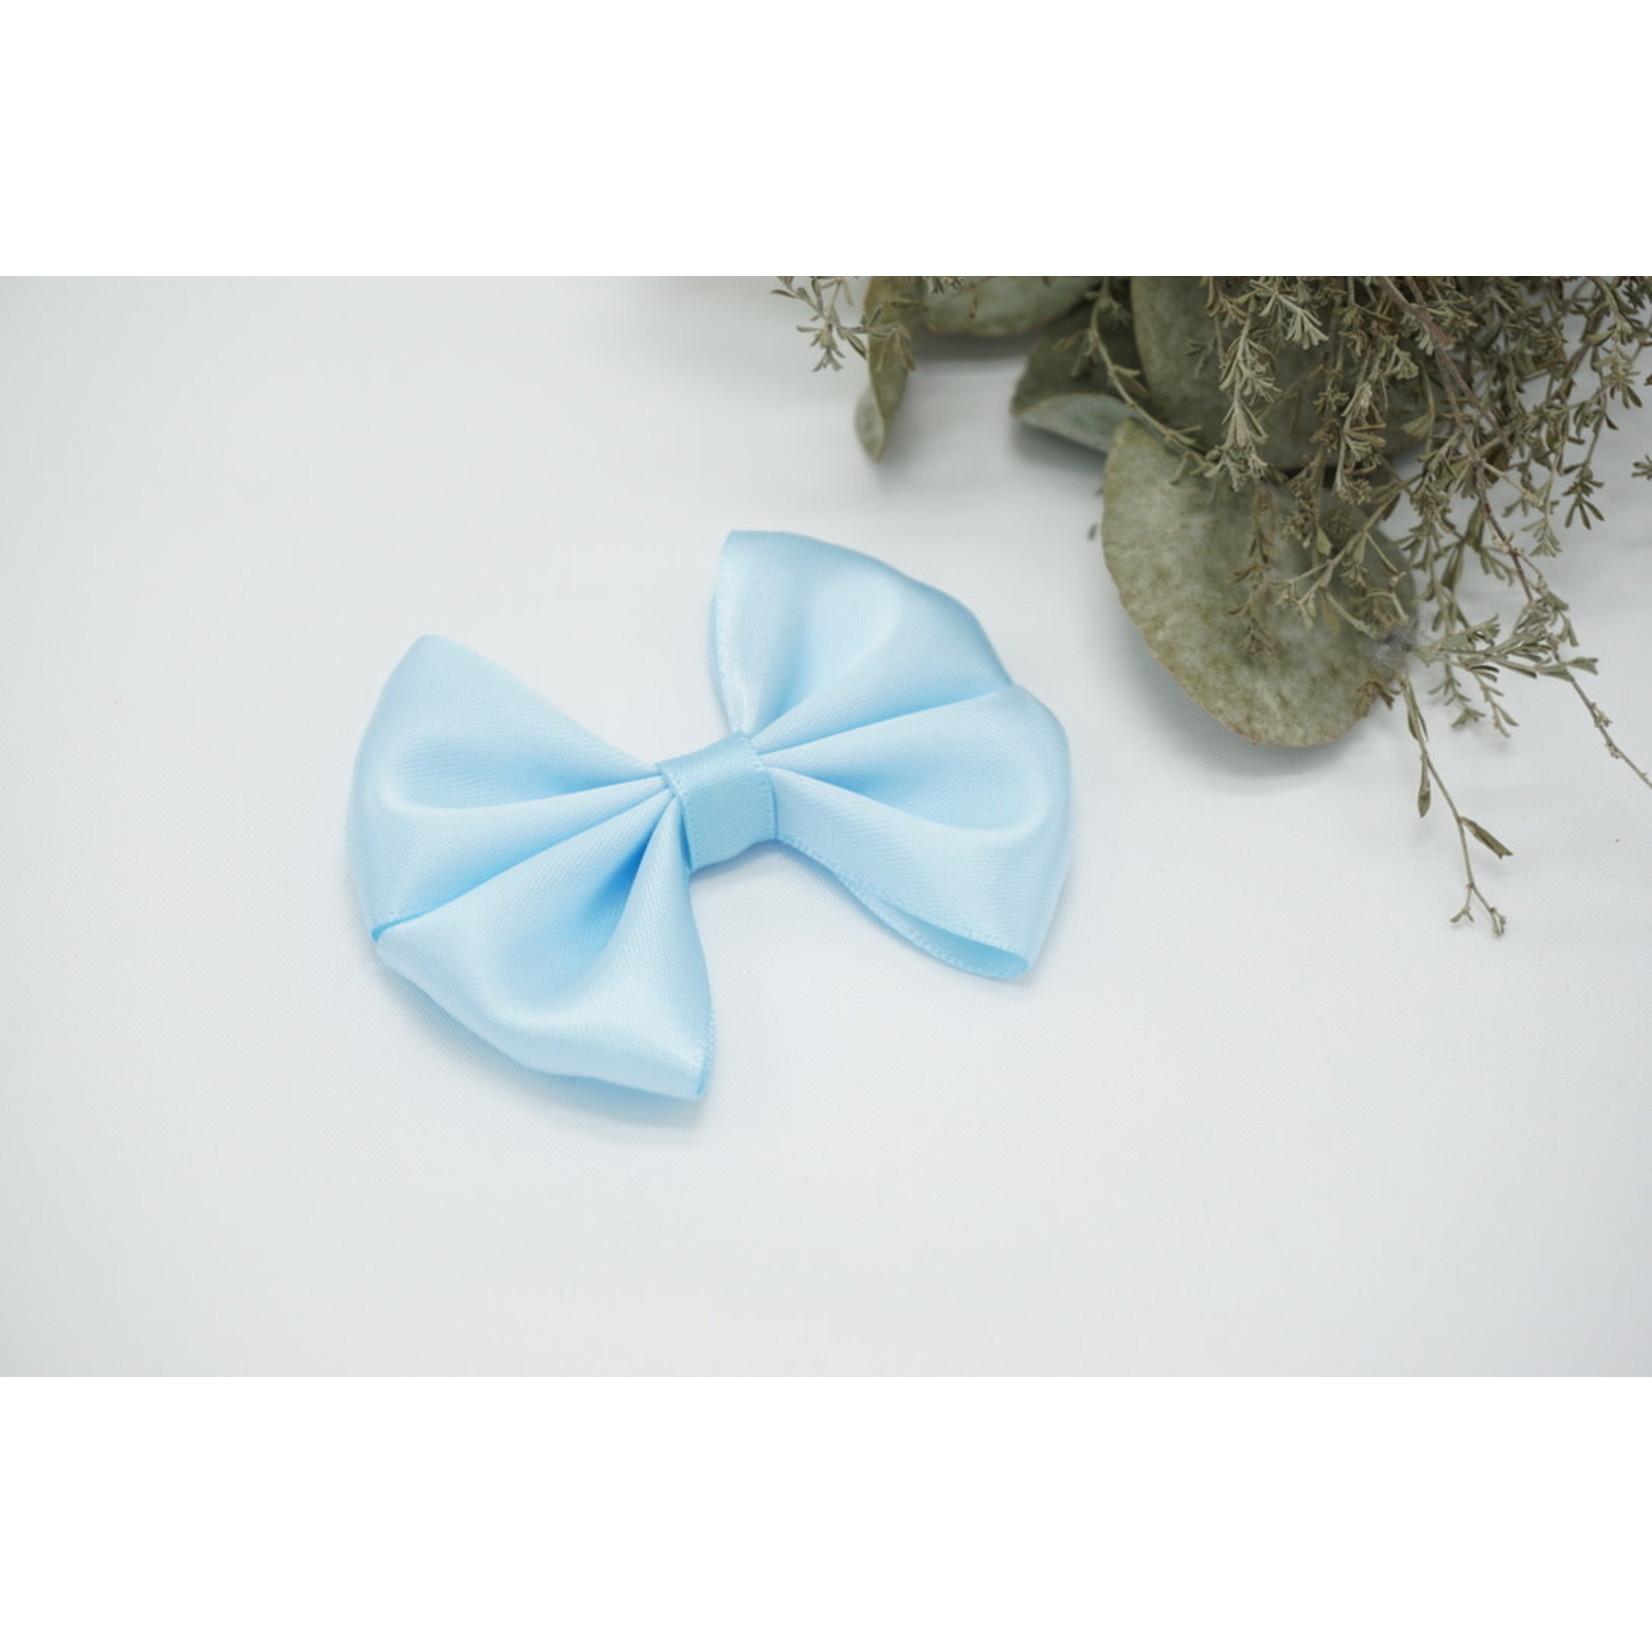 Petite Zara Satin Bow - Light Blue